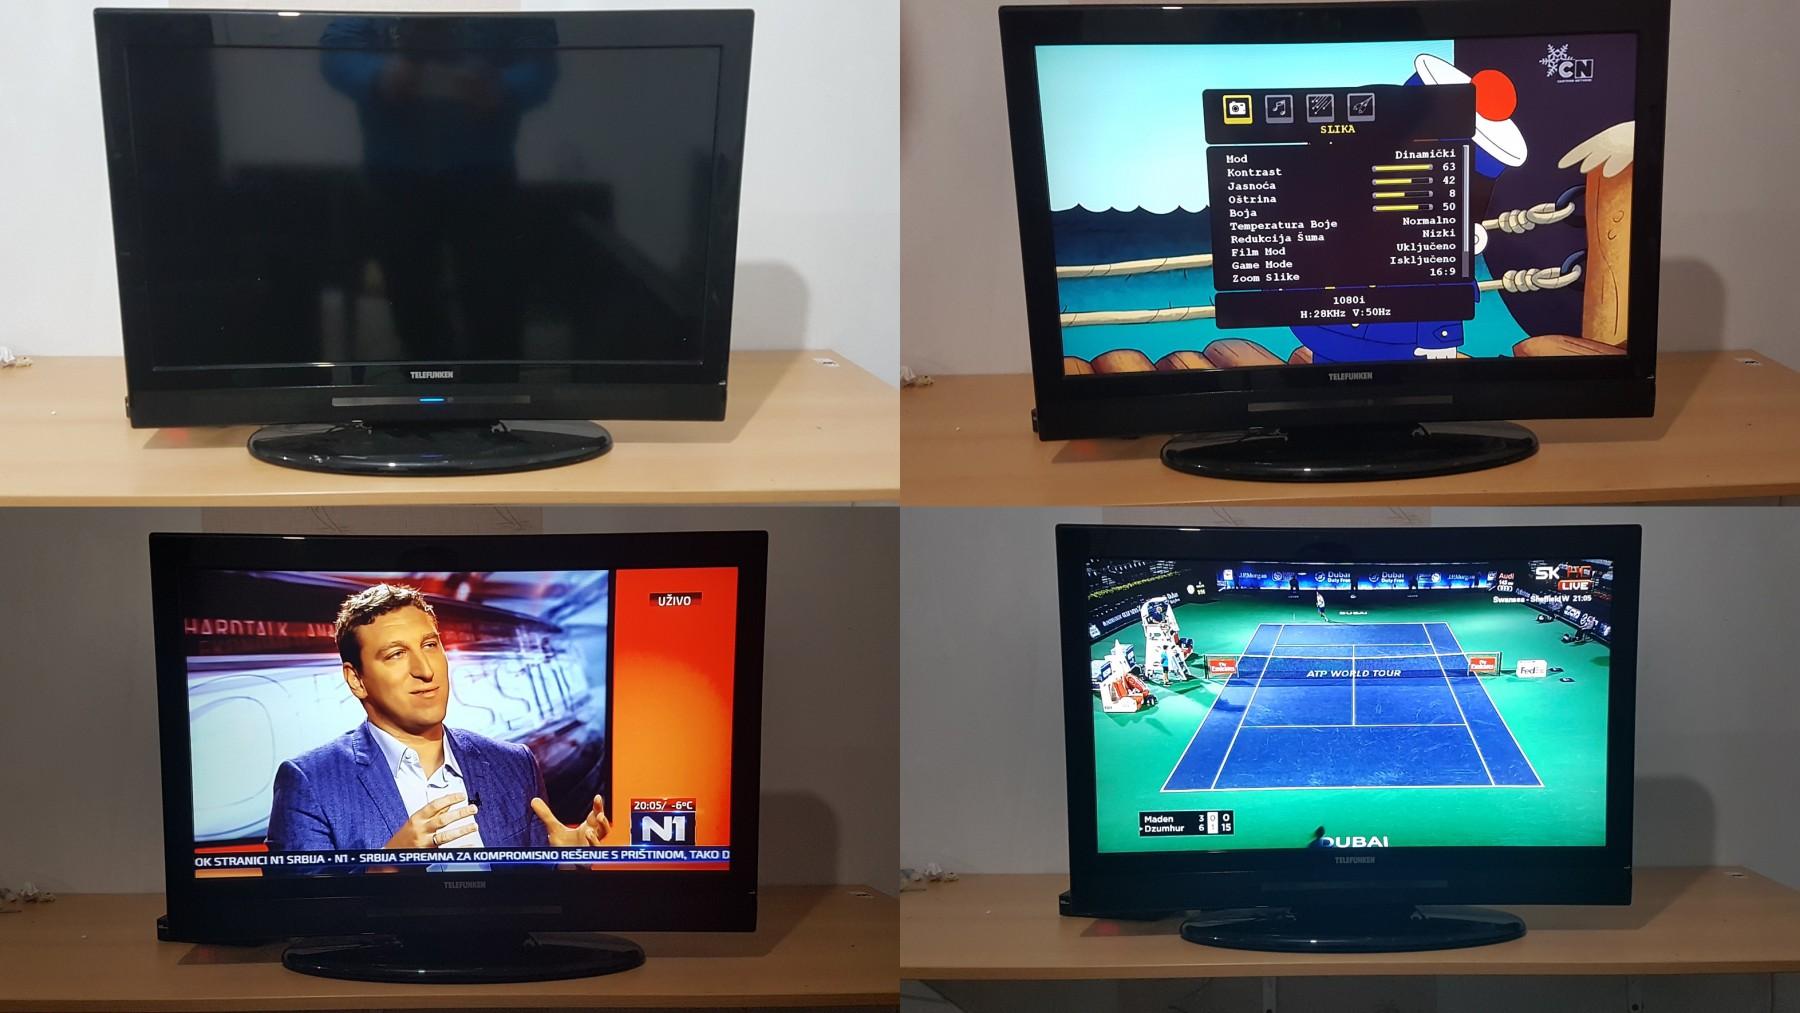 55 LCD tv TELEFUNKEN 32 inca FULL HD,hdmi,USB (64110433